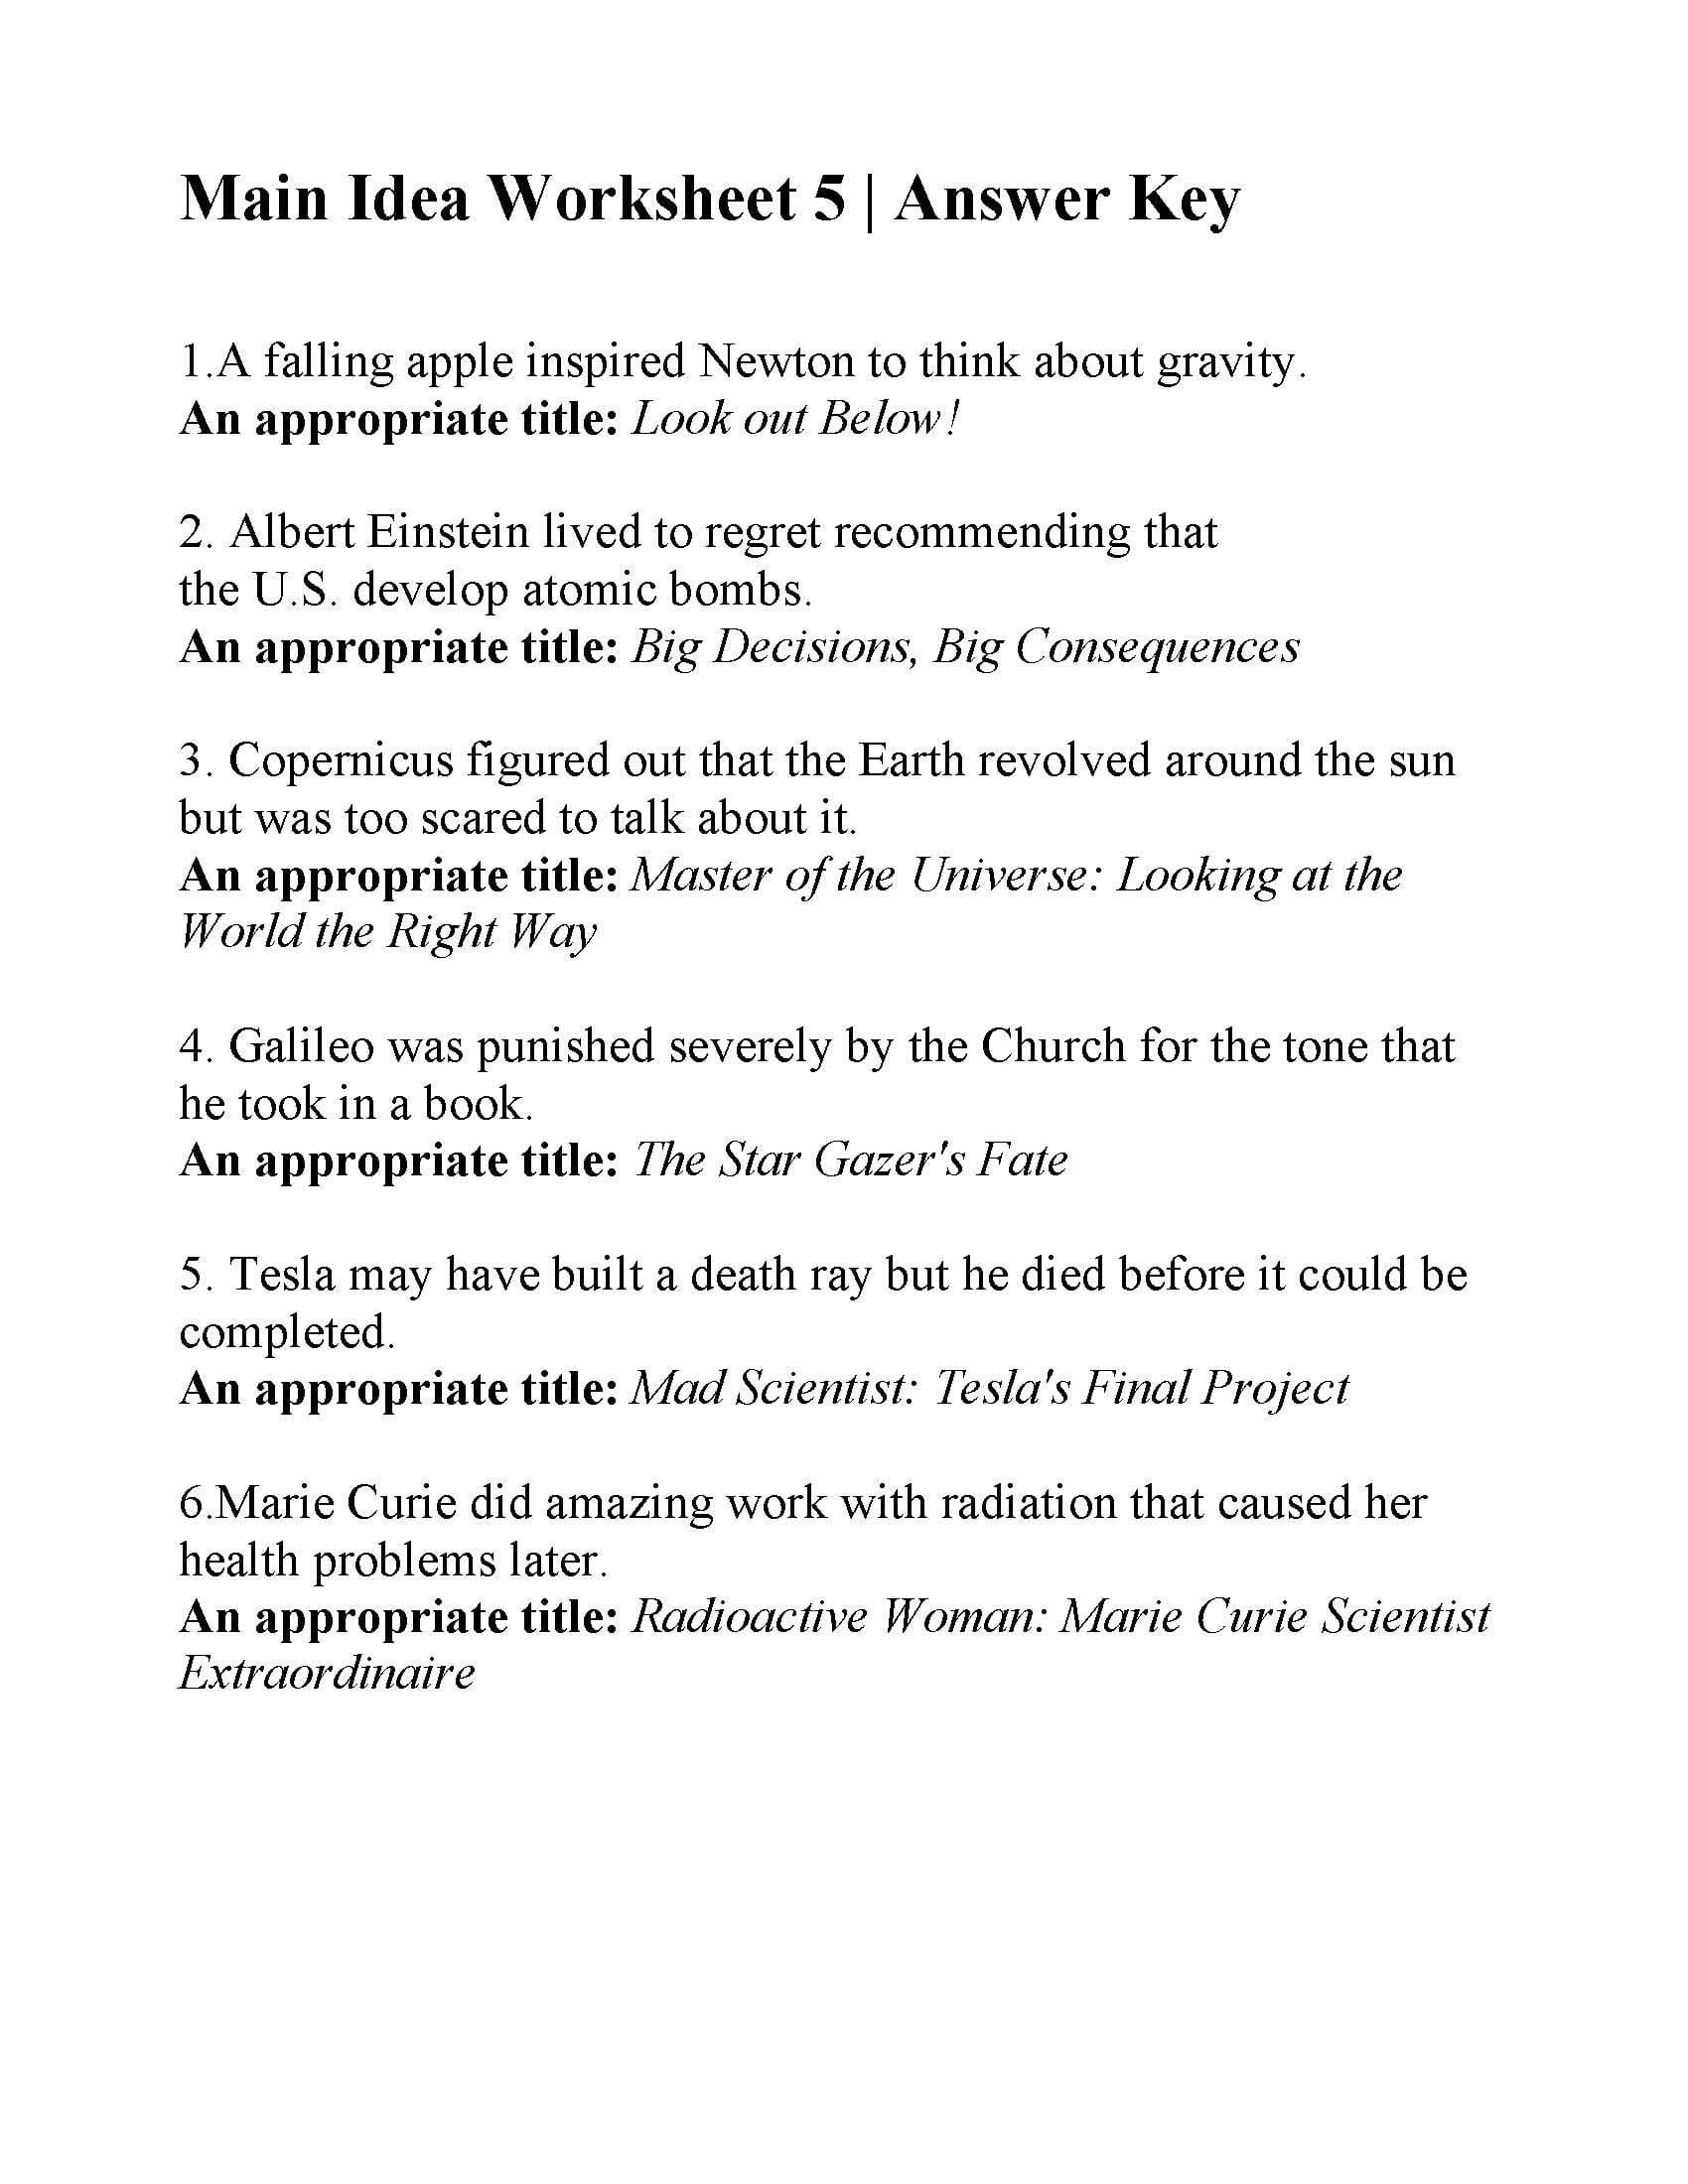 Main Idea Worksheet 5 Answers